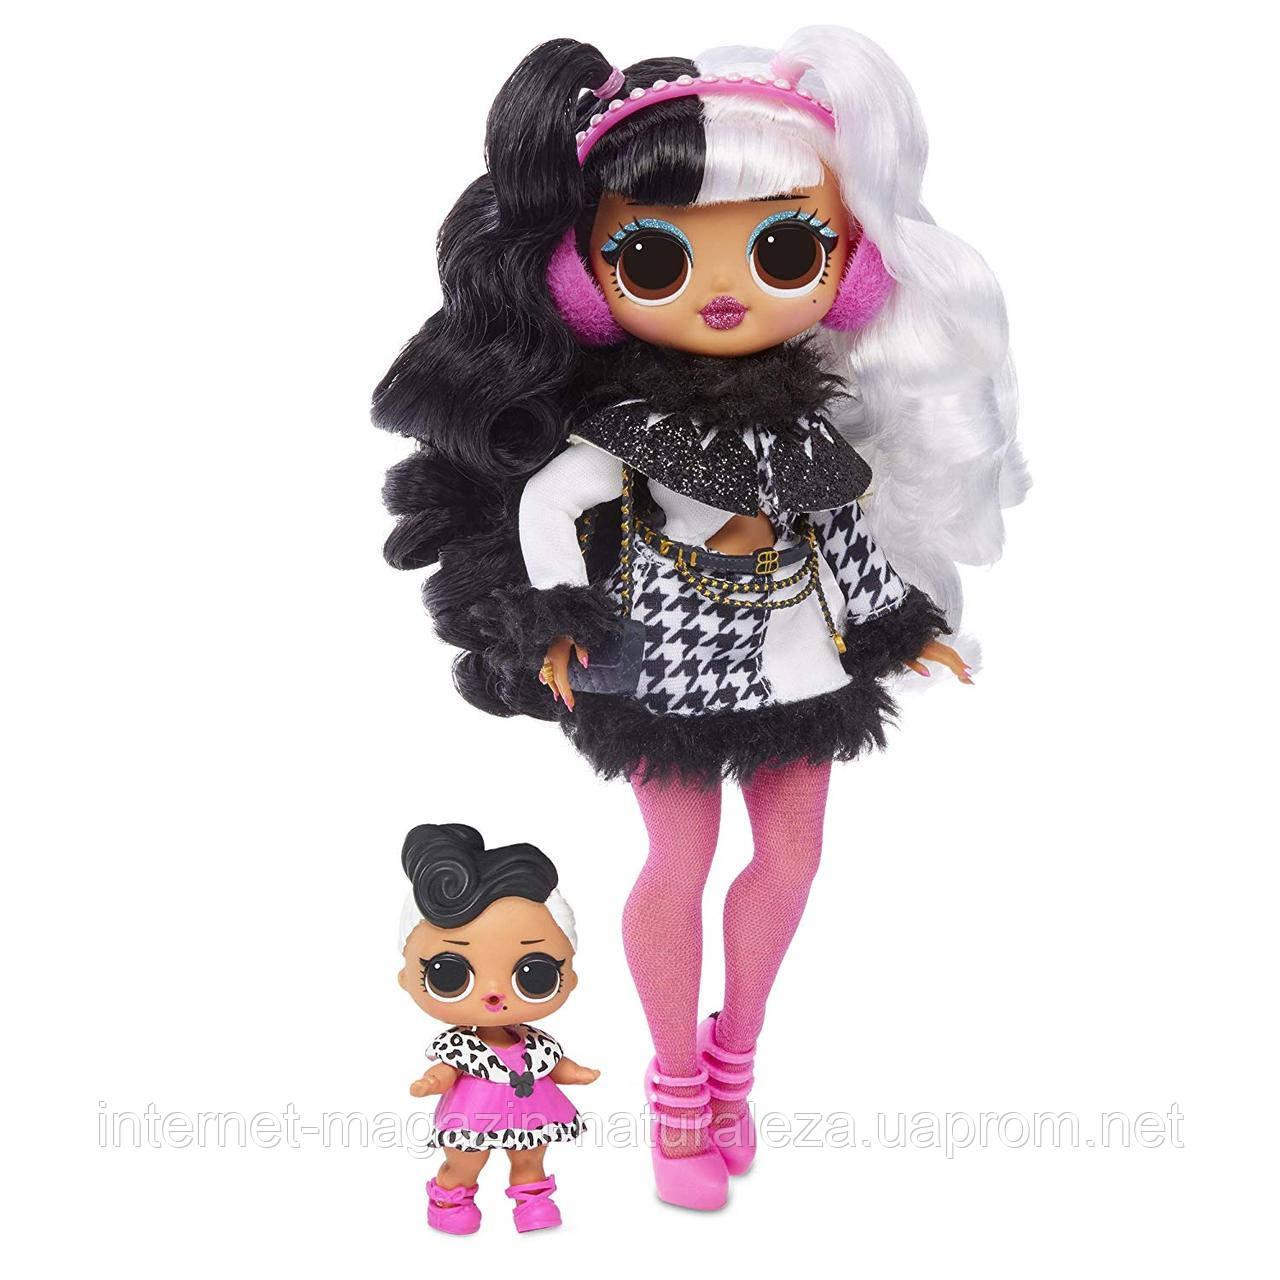 Кукла L.O.L OMG Winter Disco Dollie